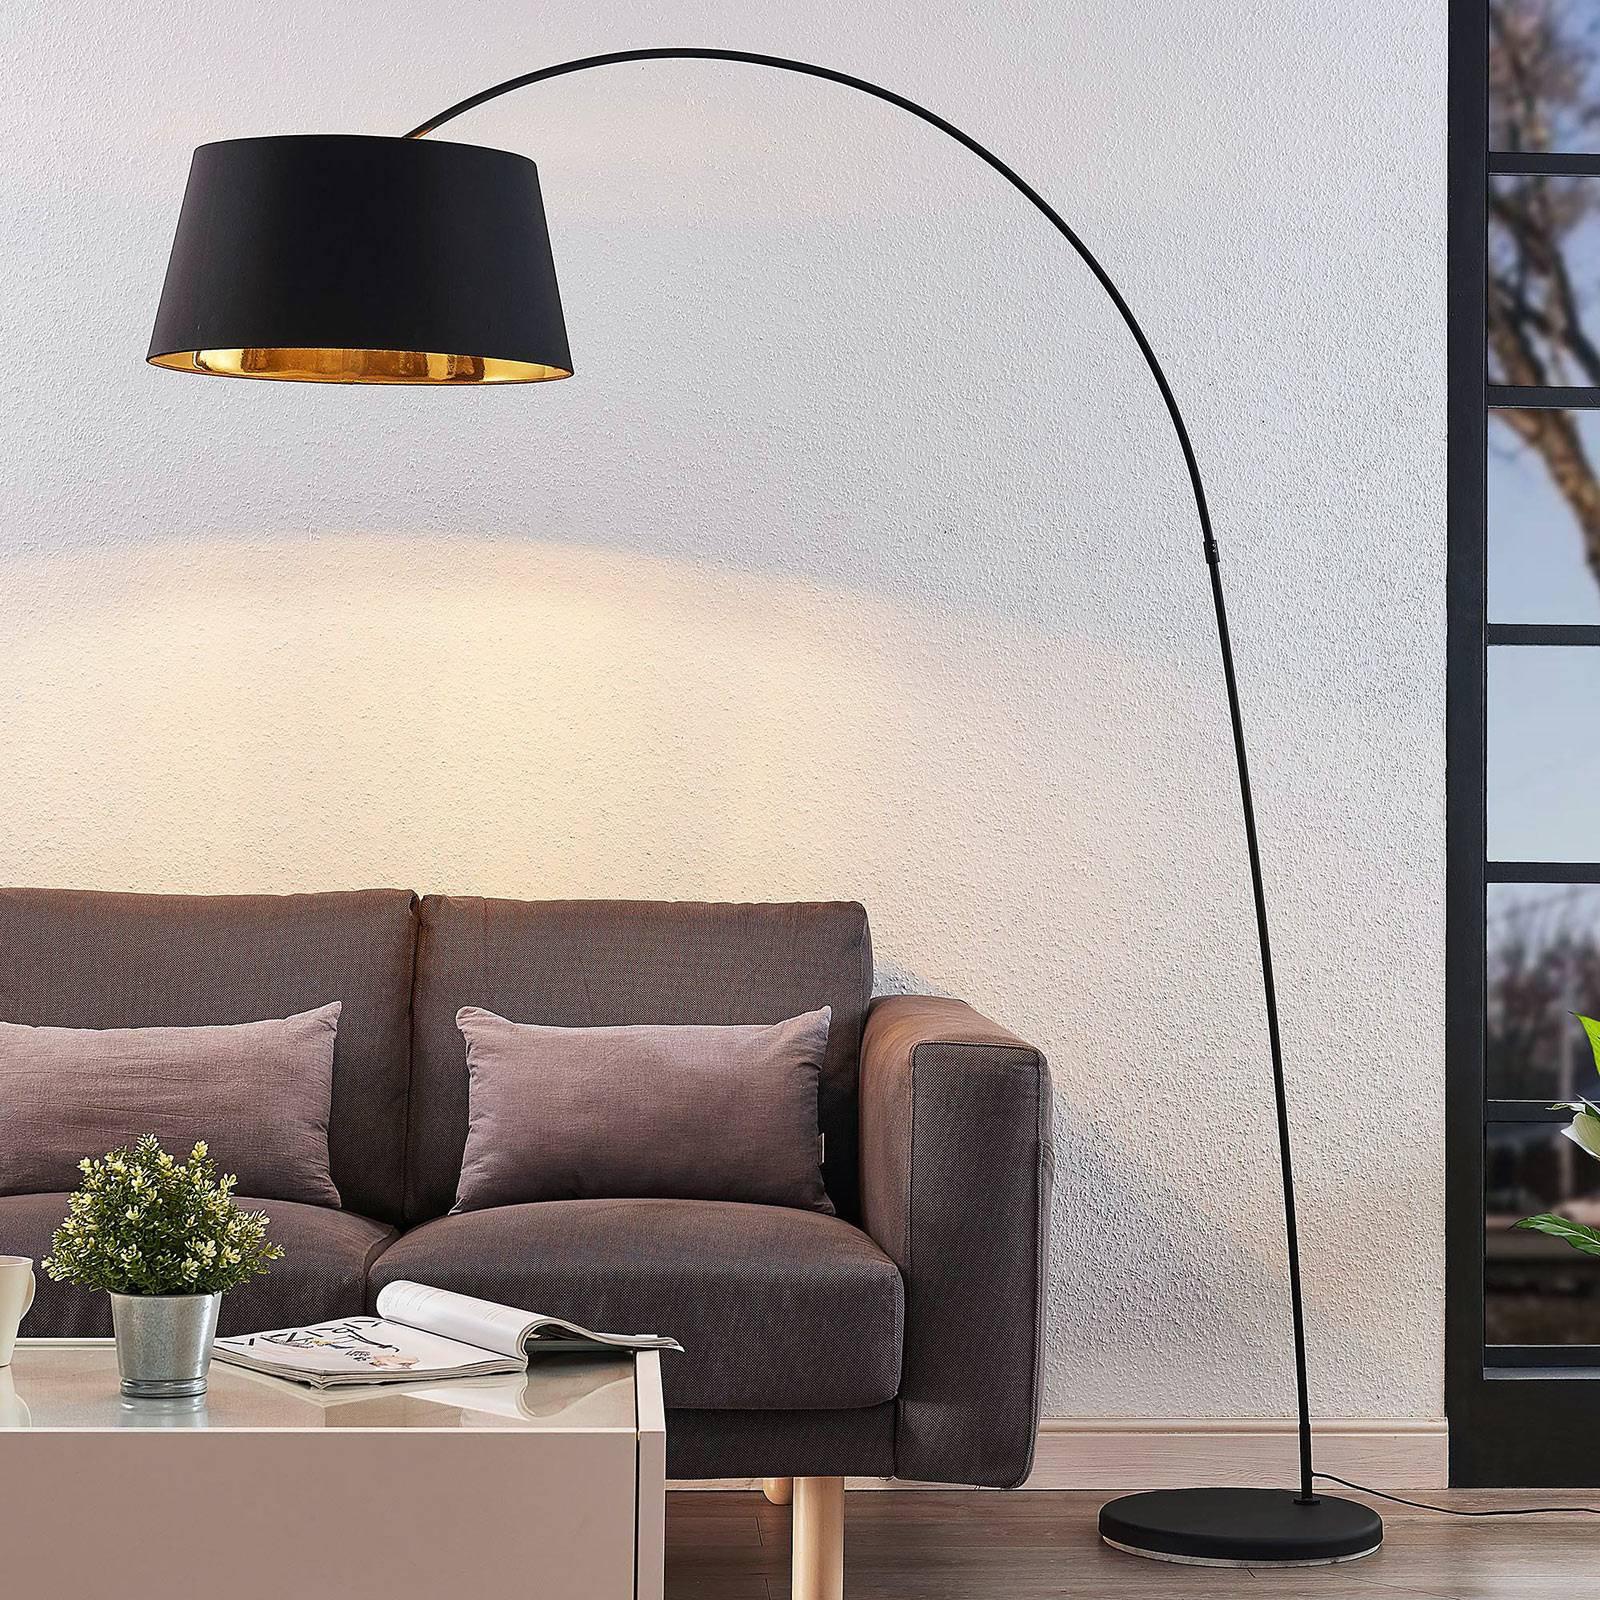 Esti buet gulvlampe med stoffskjerm, svart-gull